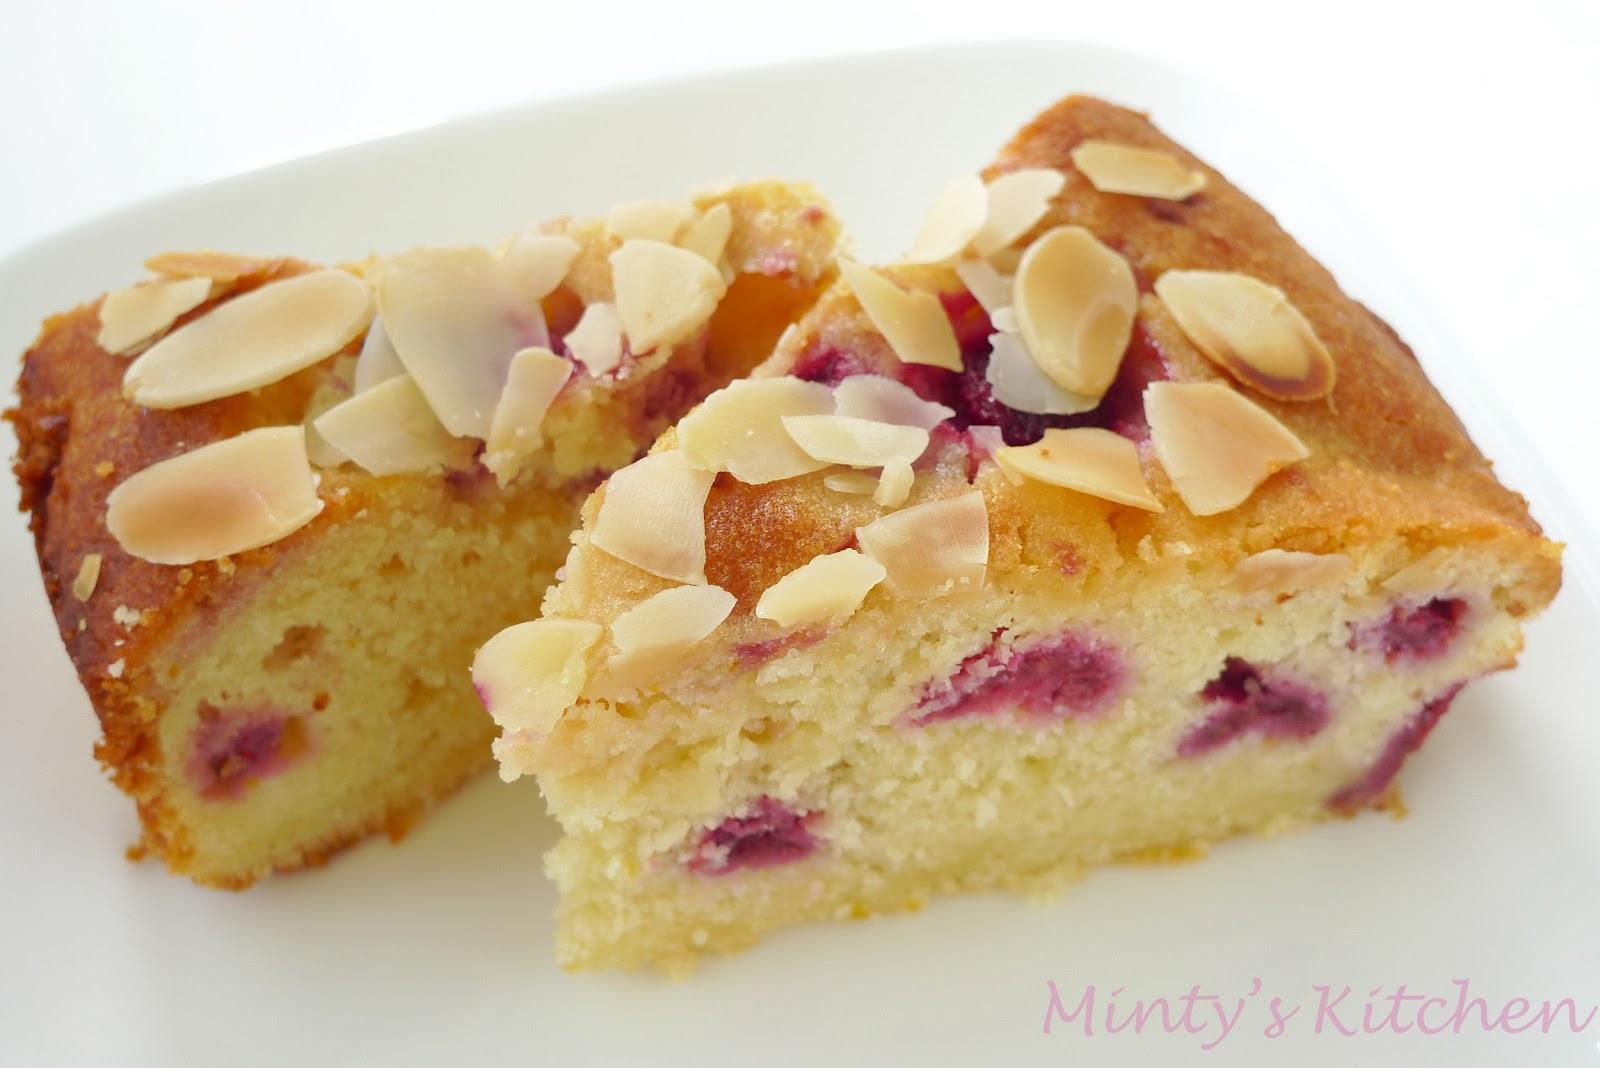 Minty's Kitchen: Raspberry-Lemon Ricotta Cake